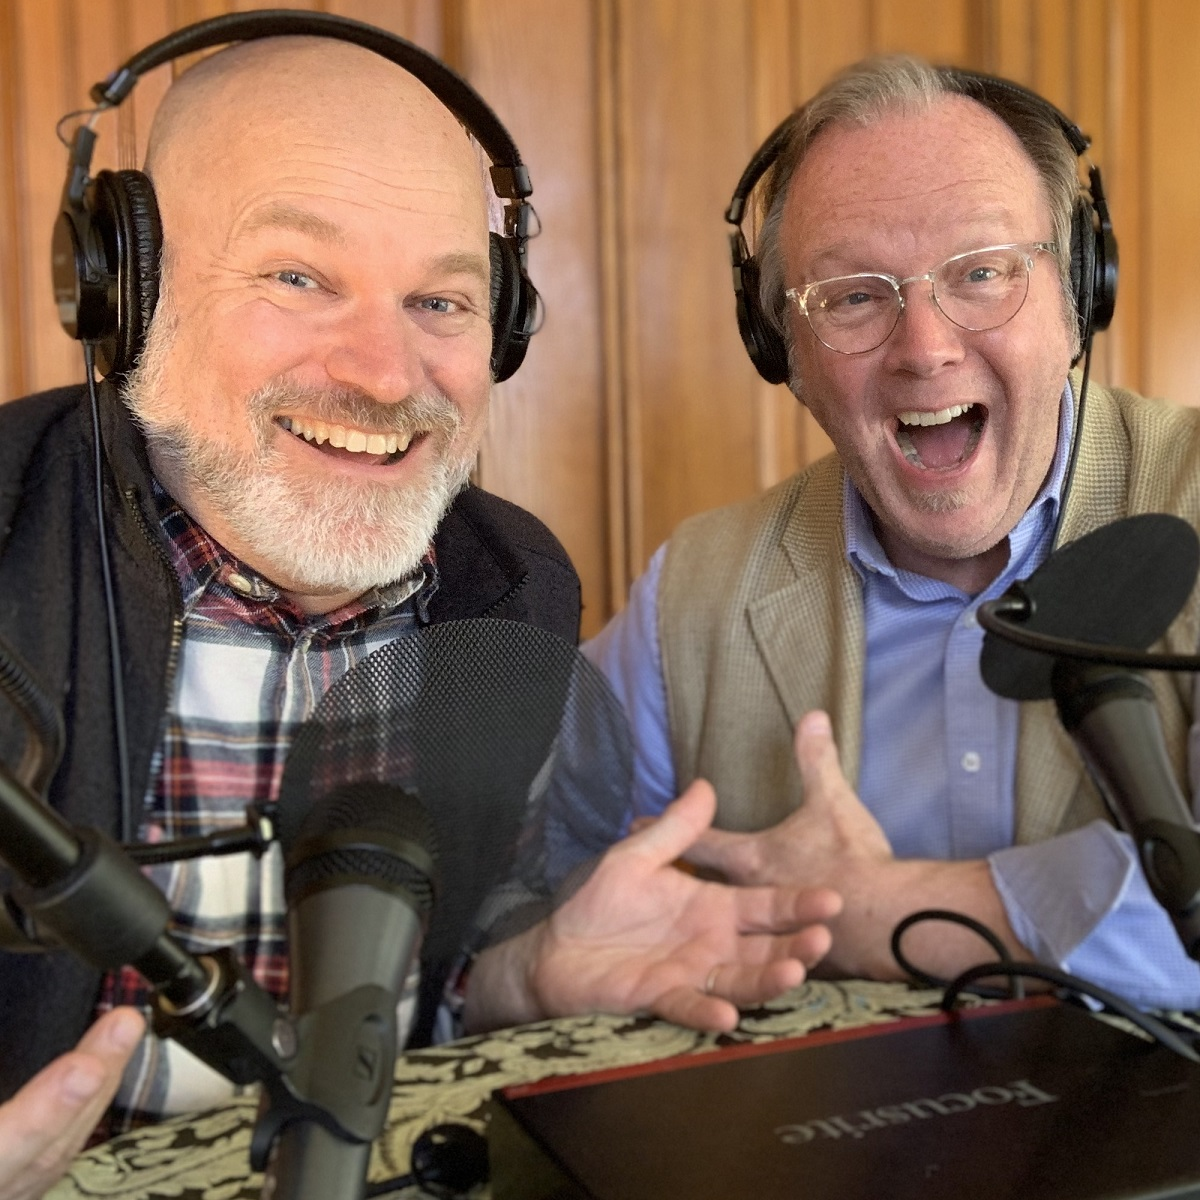 Tim and Kurt Smiling Behavioral Grooves Podcast Recording